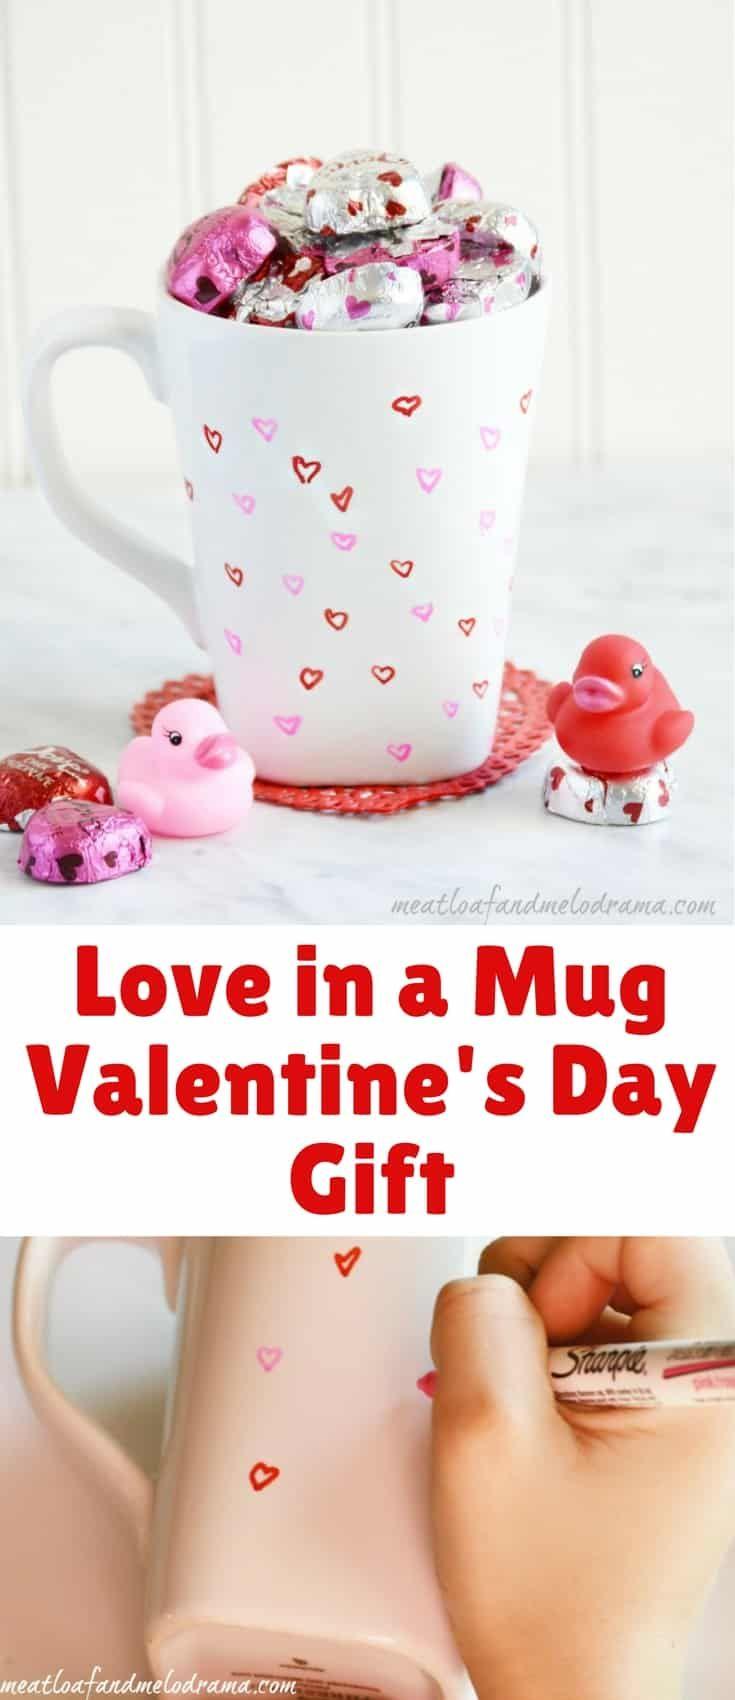 Diy love in a mug valentines day gift galentines day